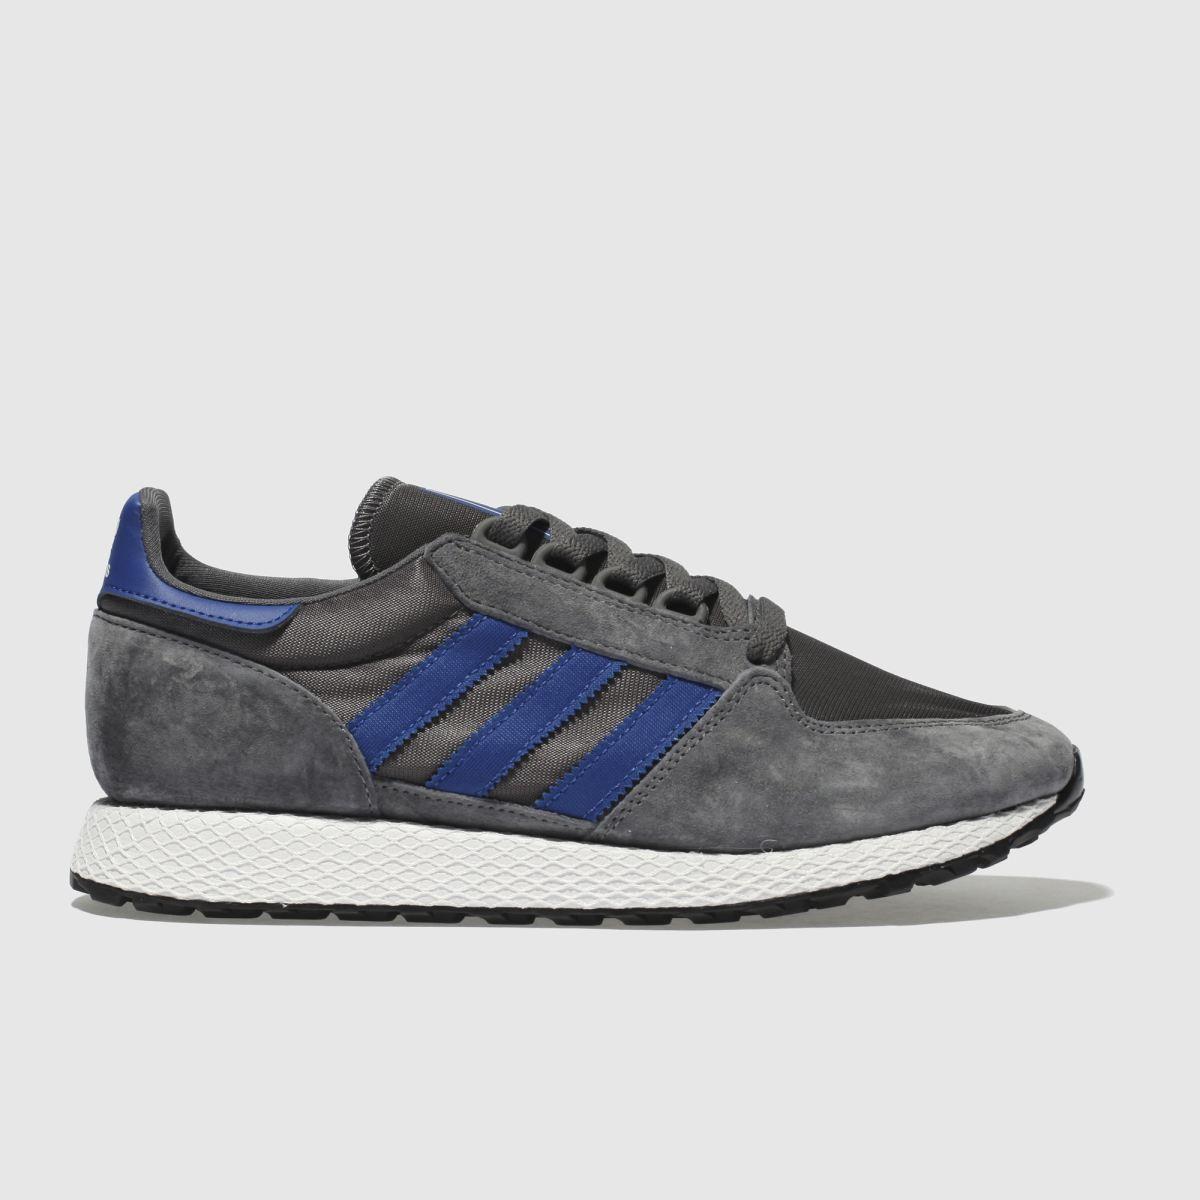 Adidas Dark Grey Forest Grove Trainers